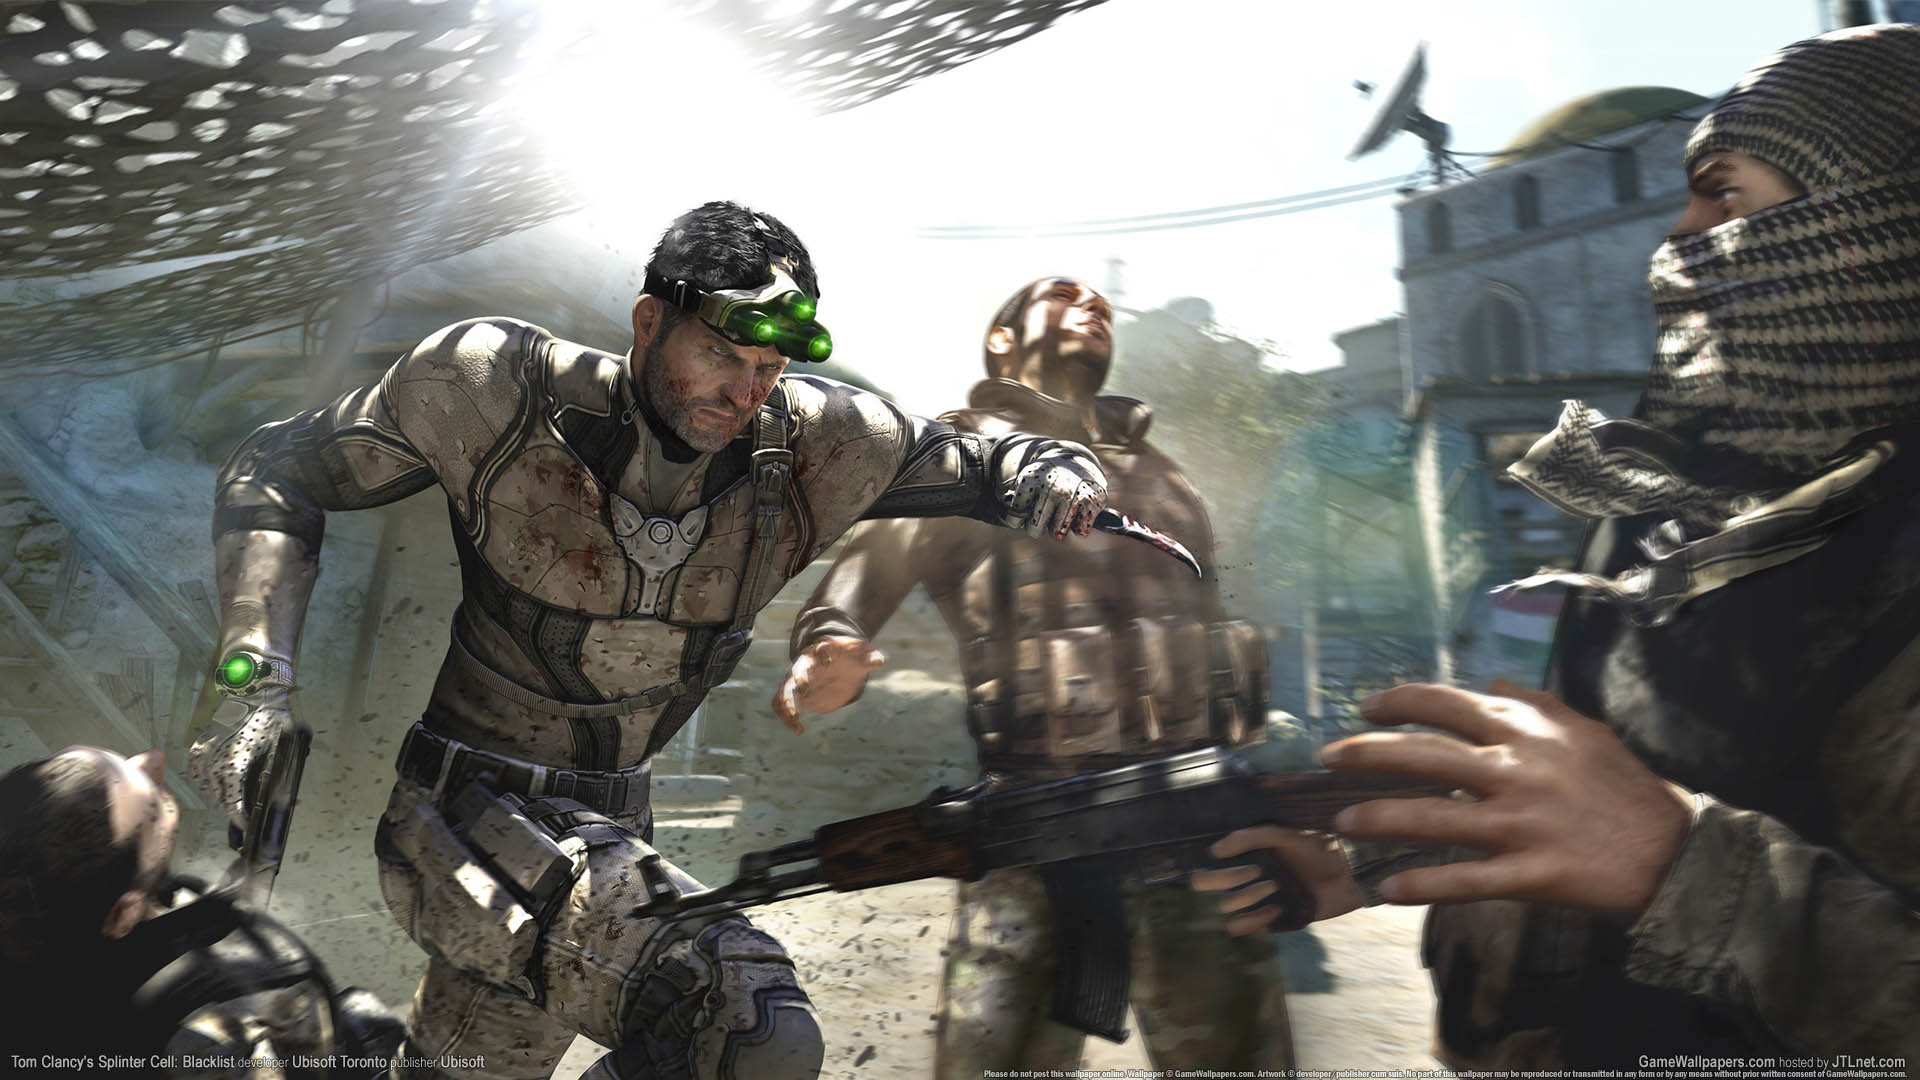 Tom Clancy's Splinter Cell: Blacklist Hintergrundbild 01 1920x1080